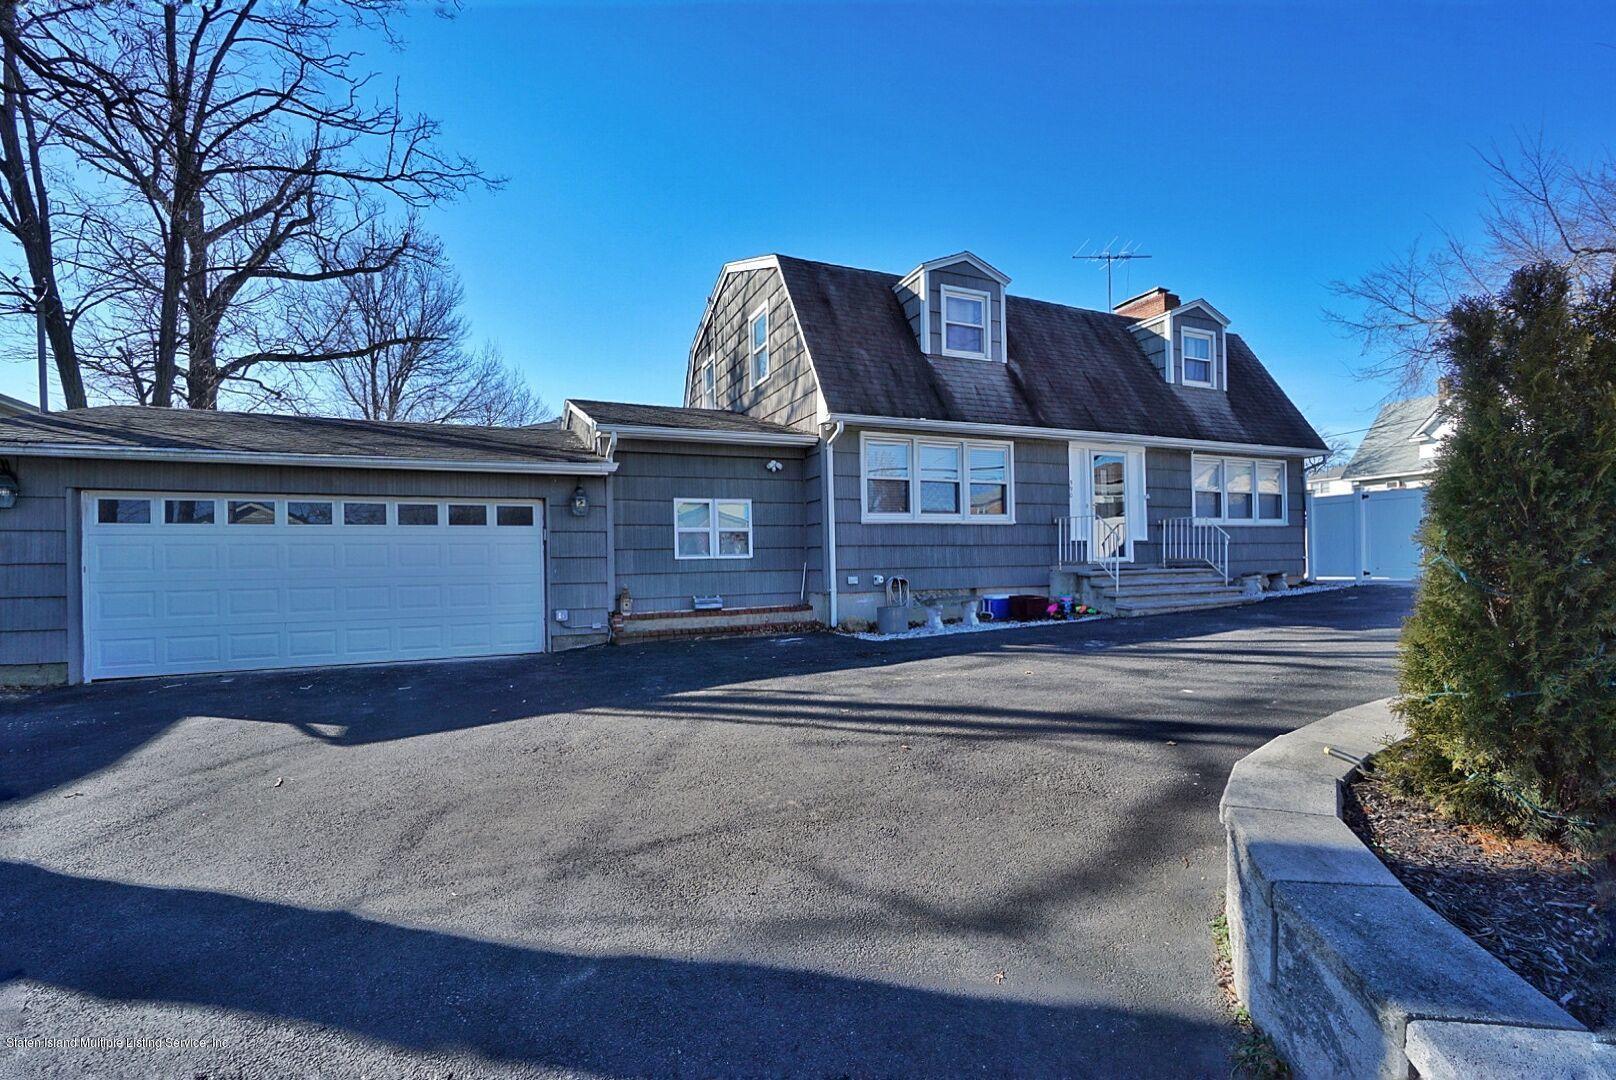 Single Family - Detached 590 Arden Avenue  Staten Island, NY 10312, MLS-1125410-4